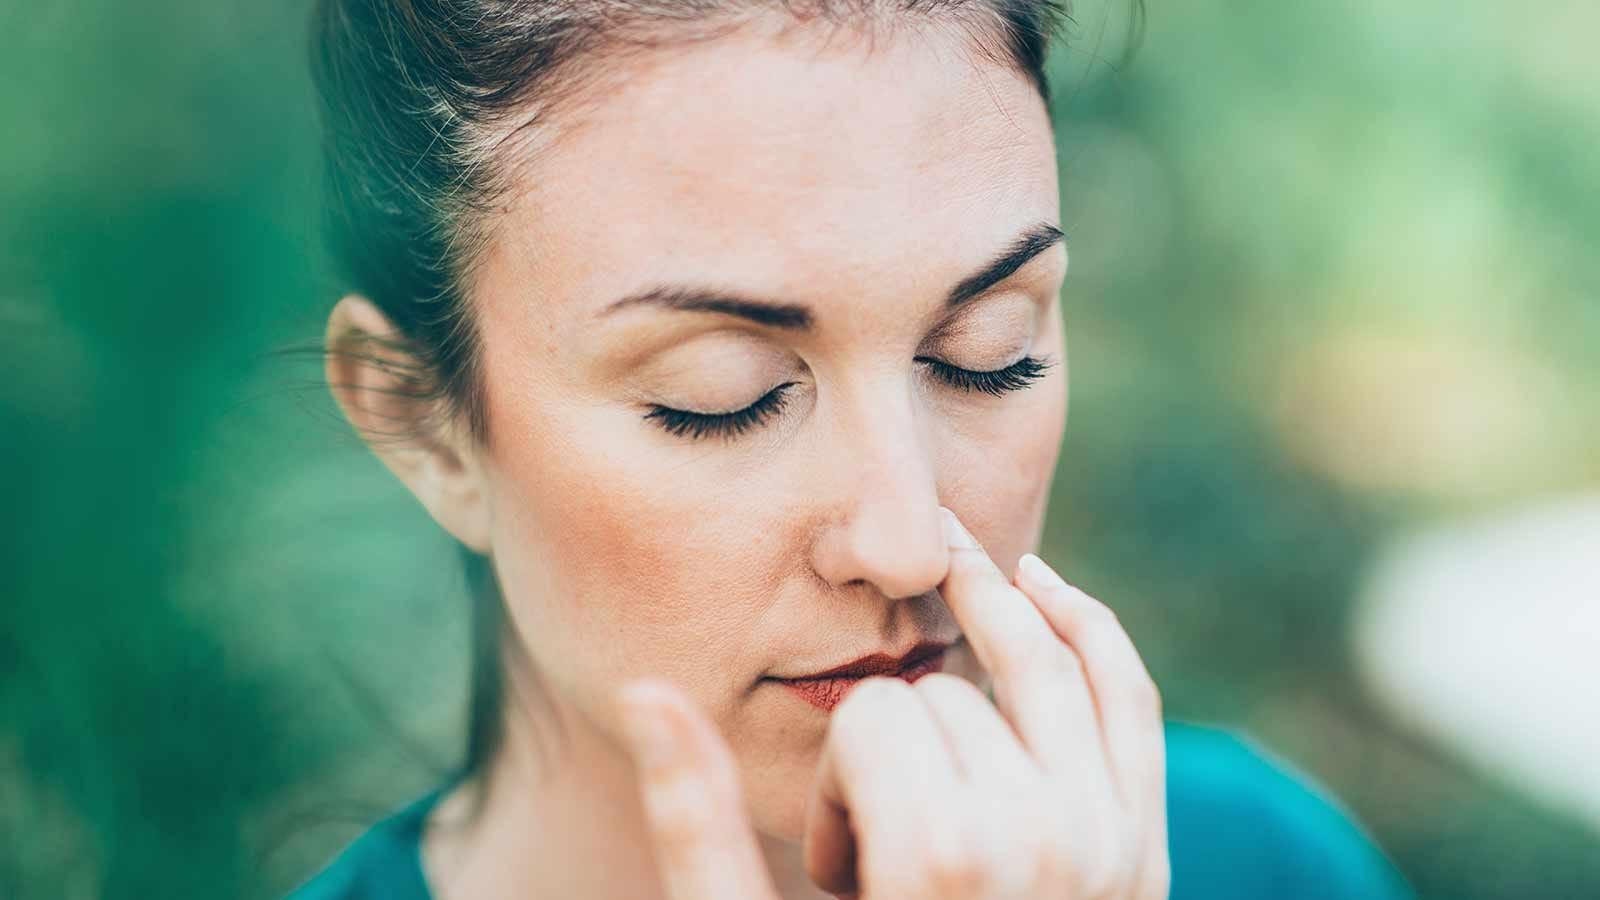 woman practicing yogic breathing